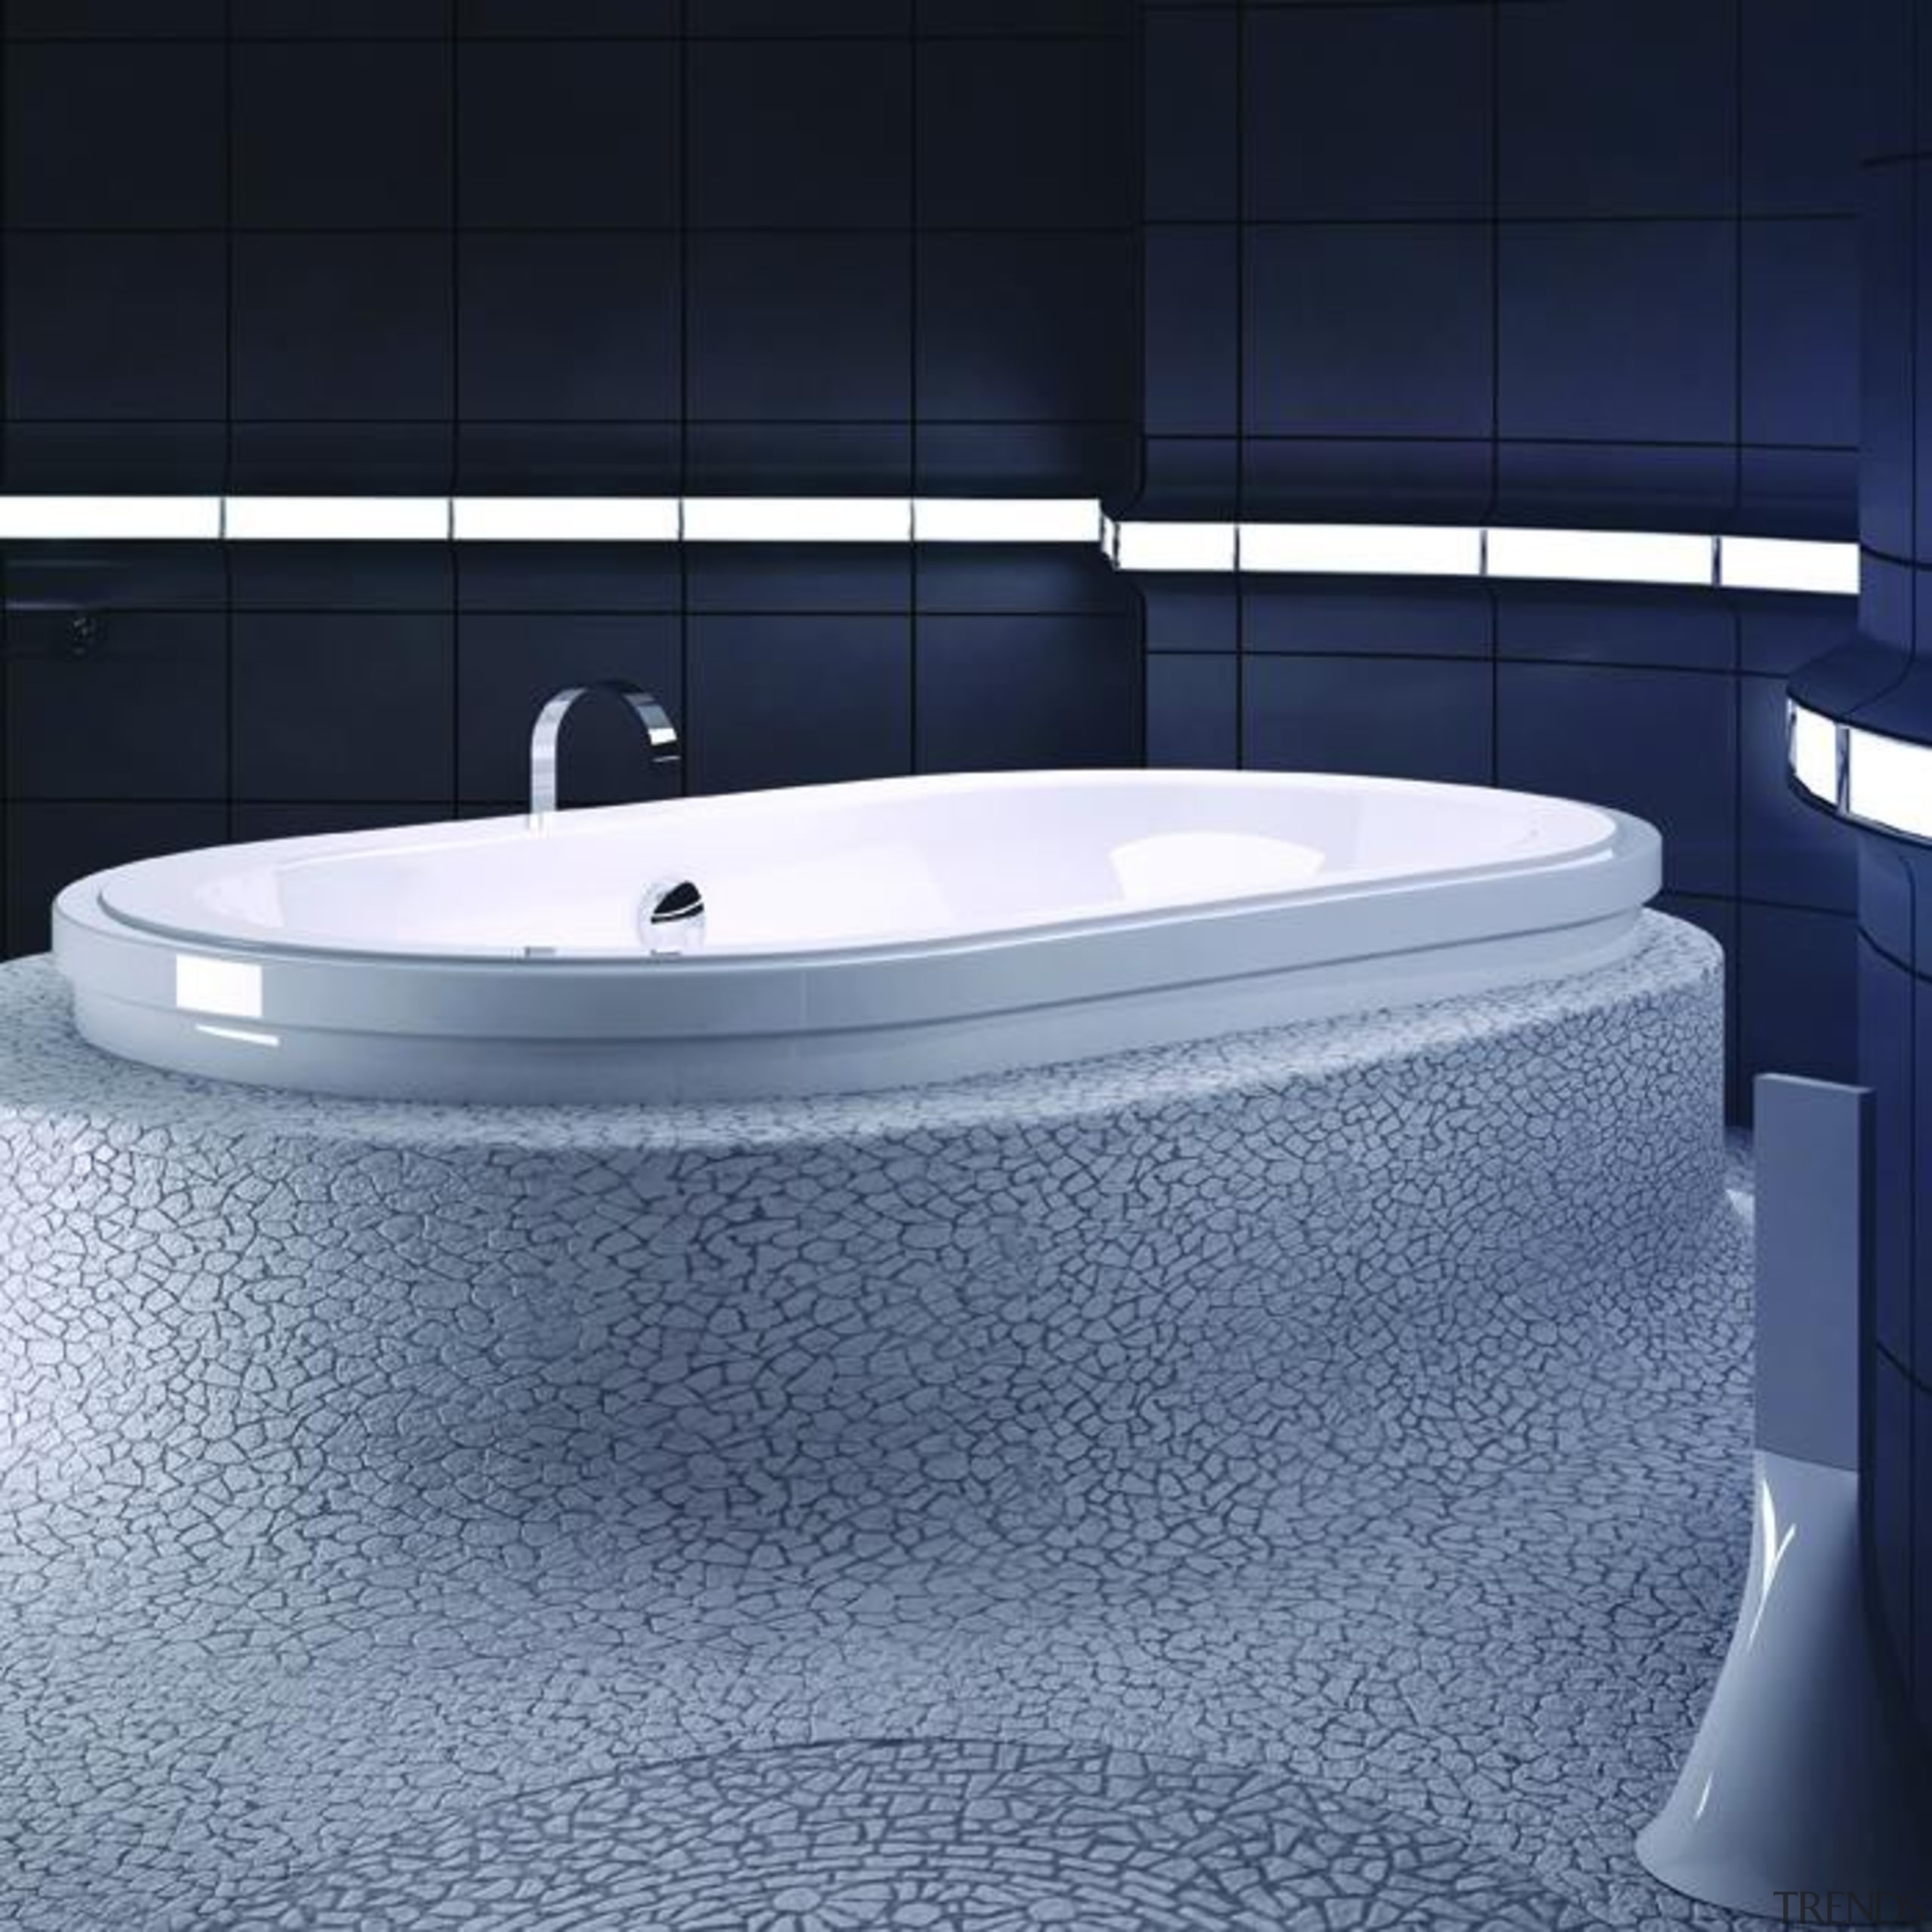 origami oval 7242 contour700x700.jpg - origami_oval_7242_contour700x700.jpg - angle angle, bathroom, bathroom sink, bathtub, floor, jacuzzi, plumbing fixture, product design, blue